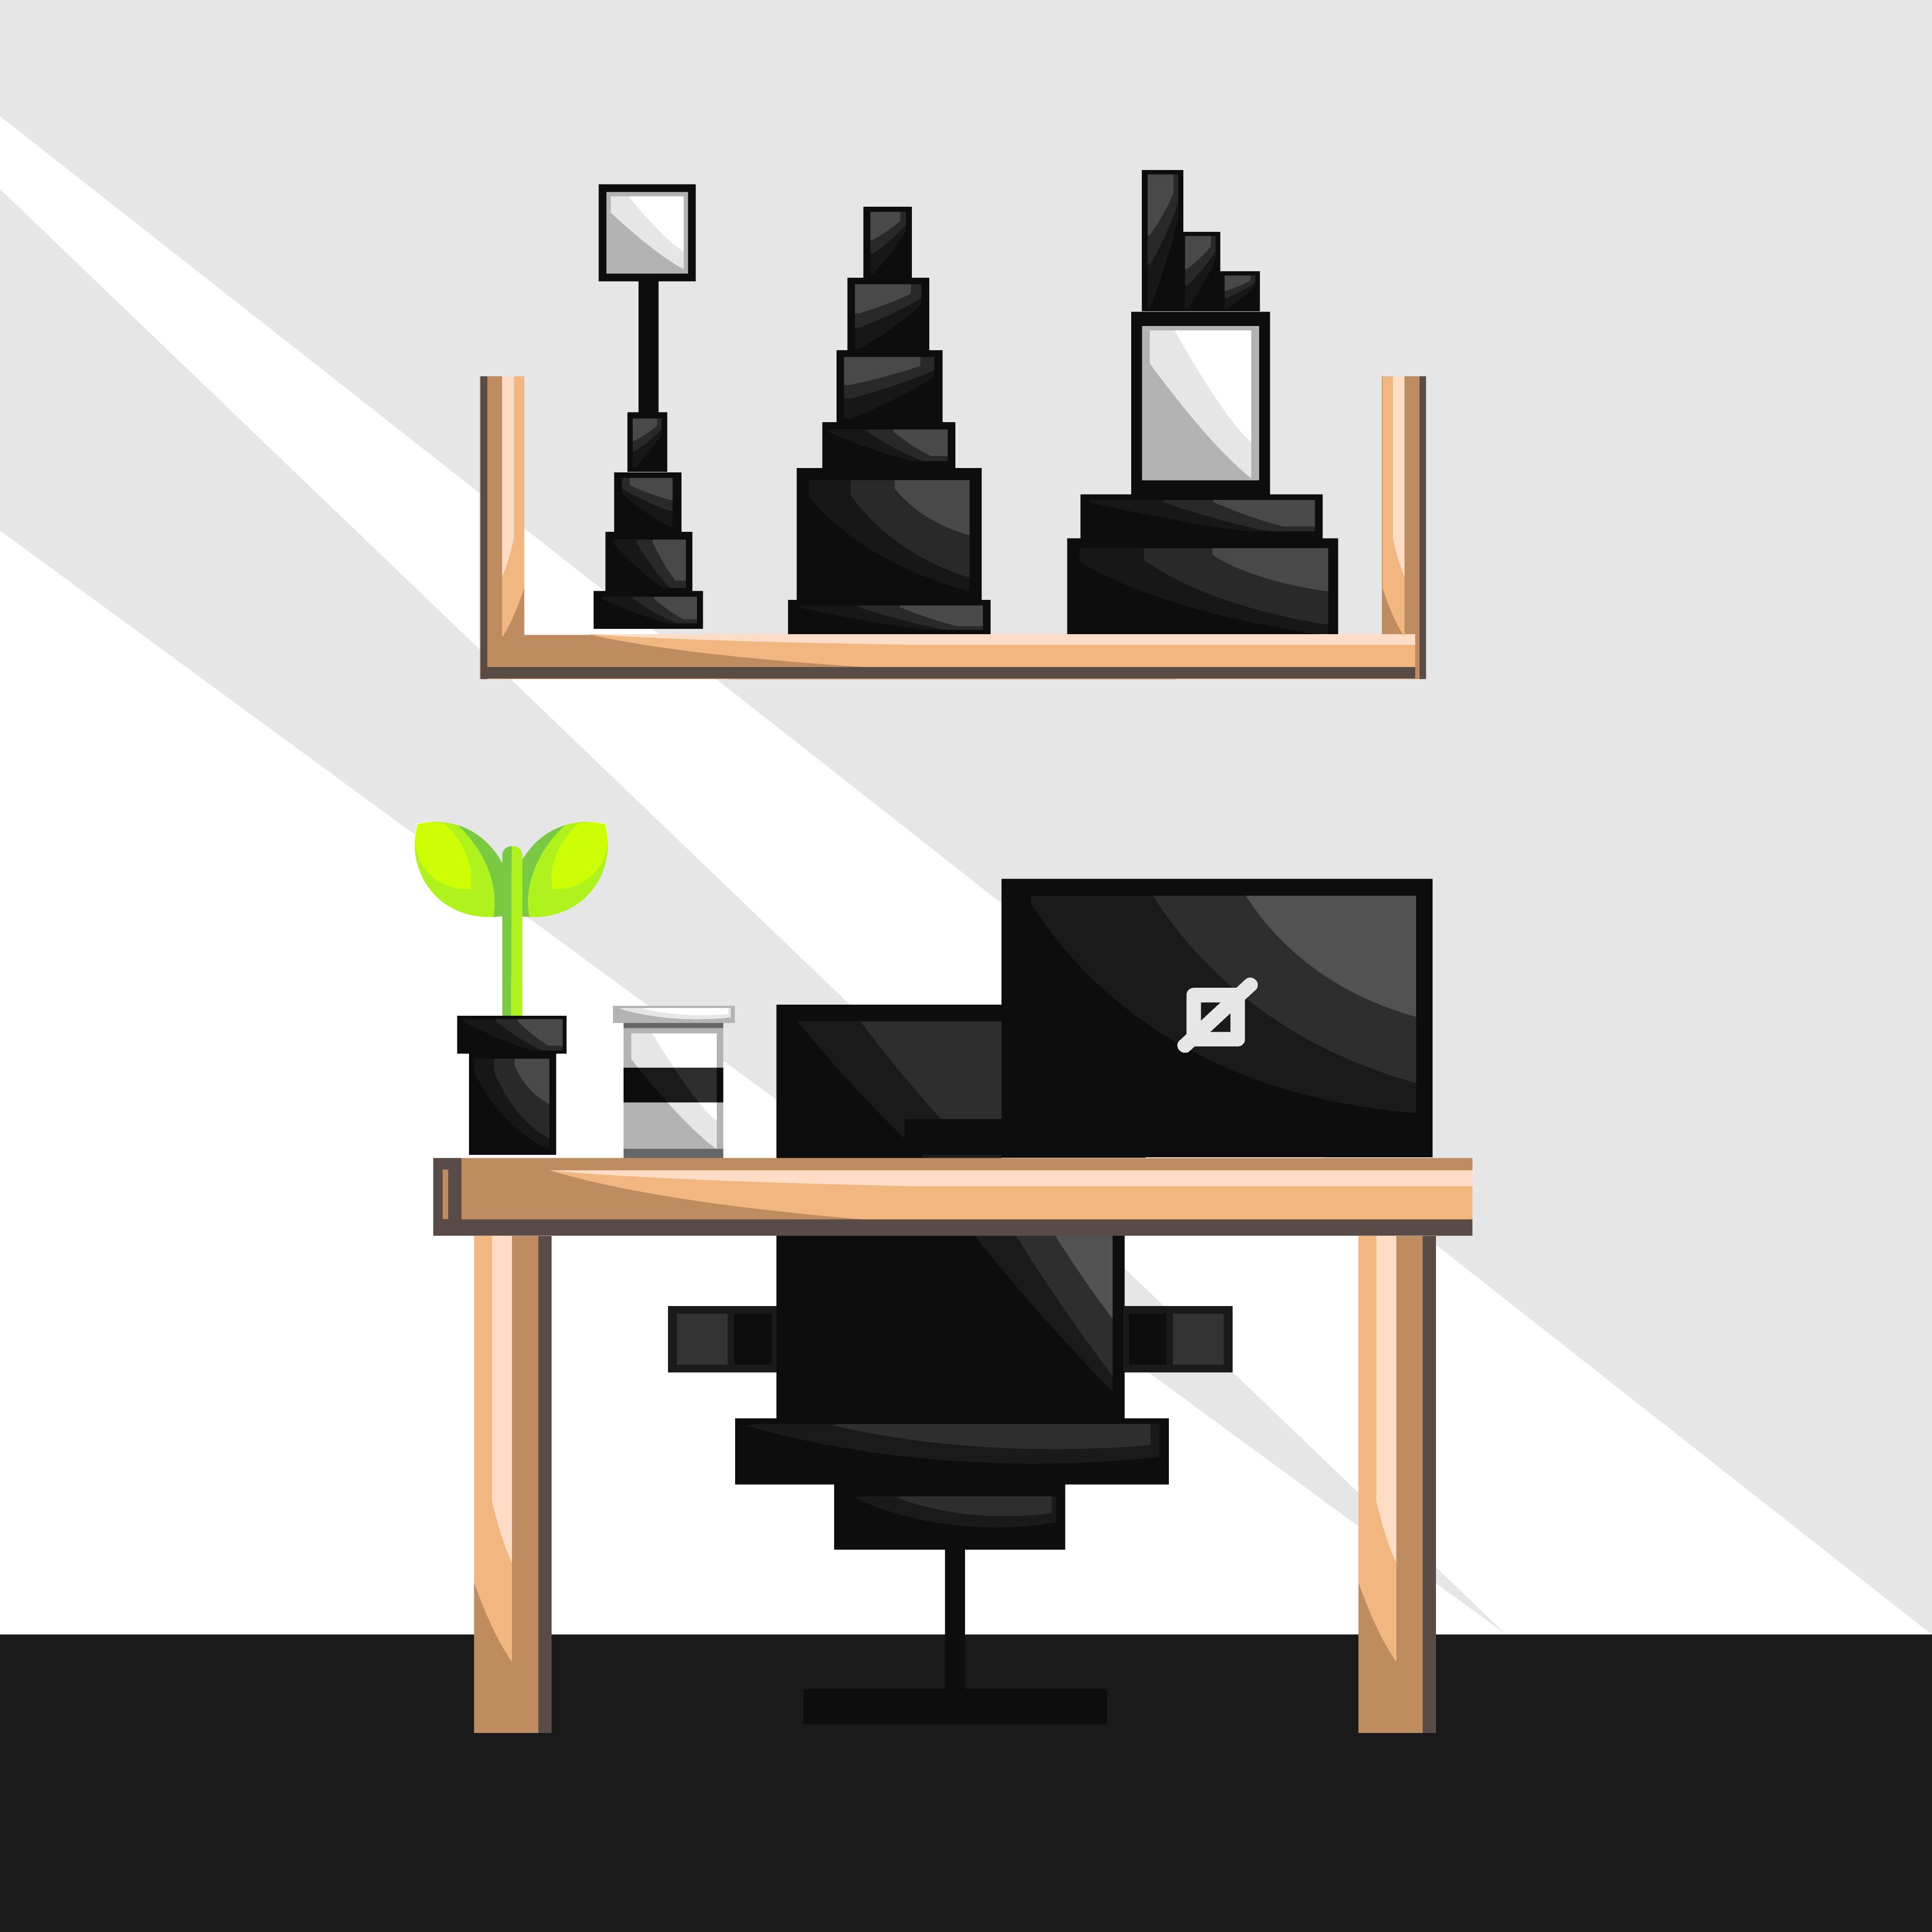 Home office interior design - Download Free Vectors ...